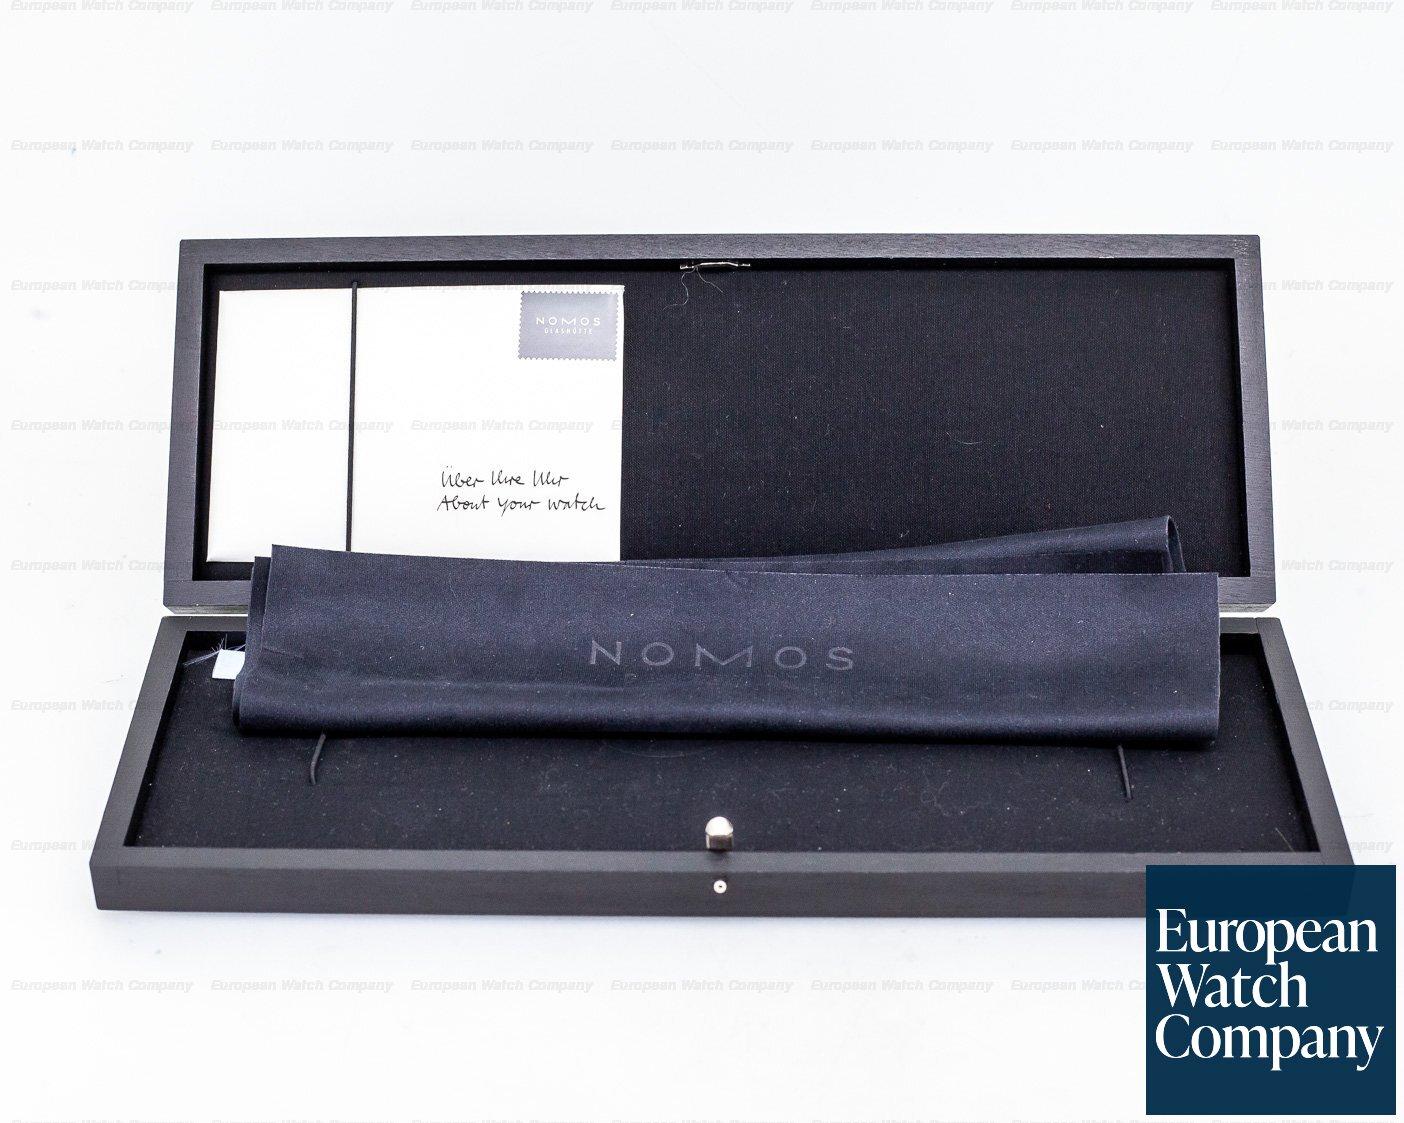 "Nomos 1109.565/100 Metro 38.5 ""Hodinkee Limited Edition"" Chronometer"